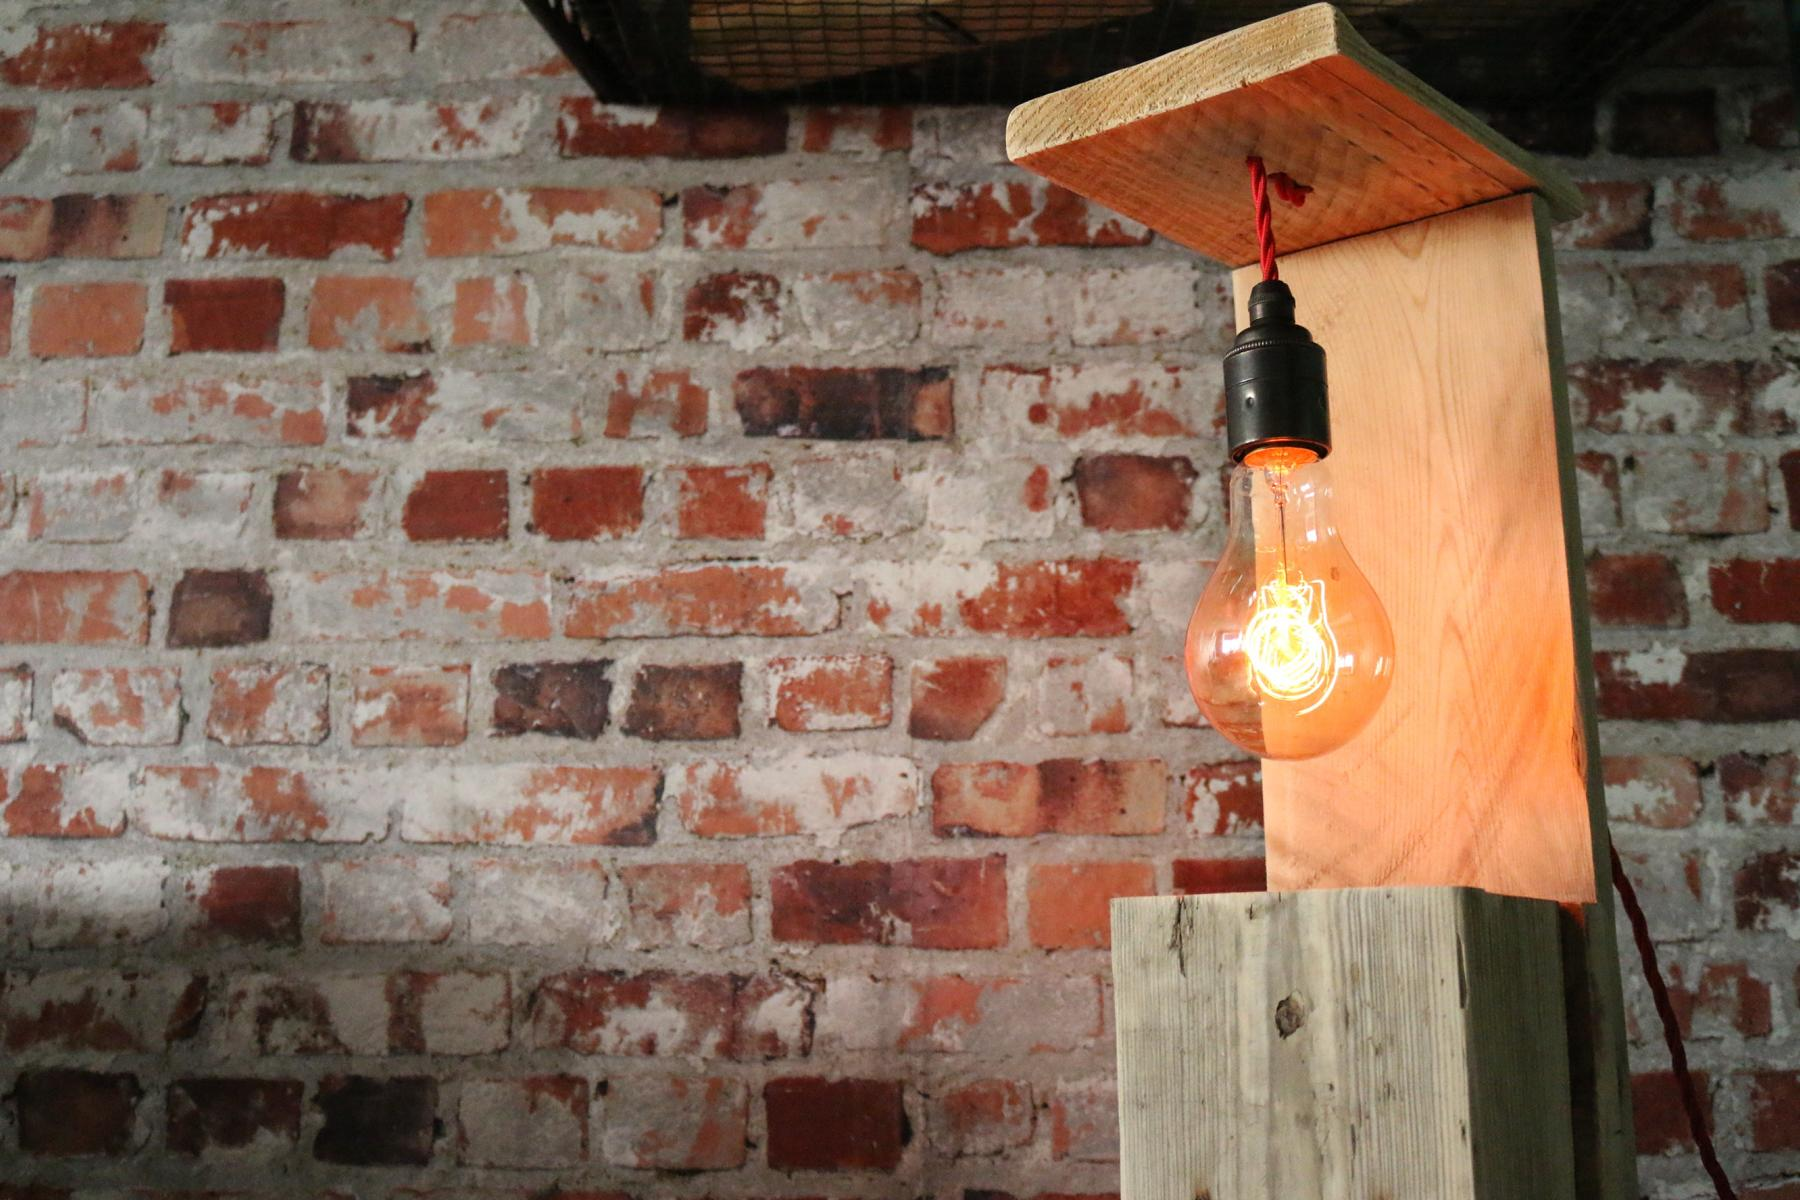 Full Size of Holz Led Lampe Selber Bauen Stehlampe Rustikal Caseconradcom Esstisch Massivholz Ausziehbar Schlafzimmer Wandlampe Tischlampe Wohnzimmer Regal Bodengleiche Wohnzimmer Holz Led Lampe Selber Bauen